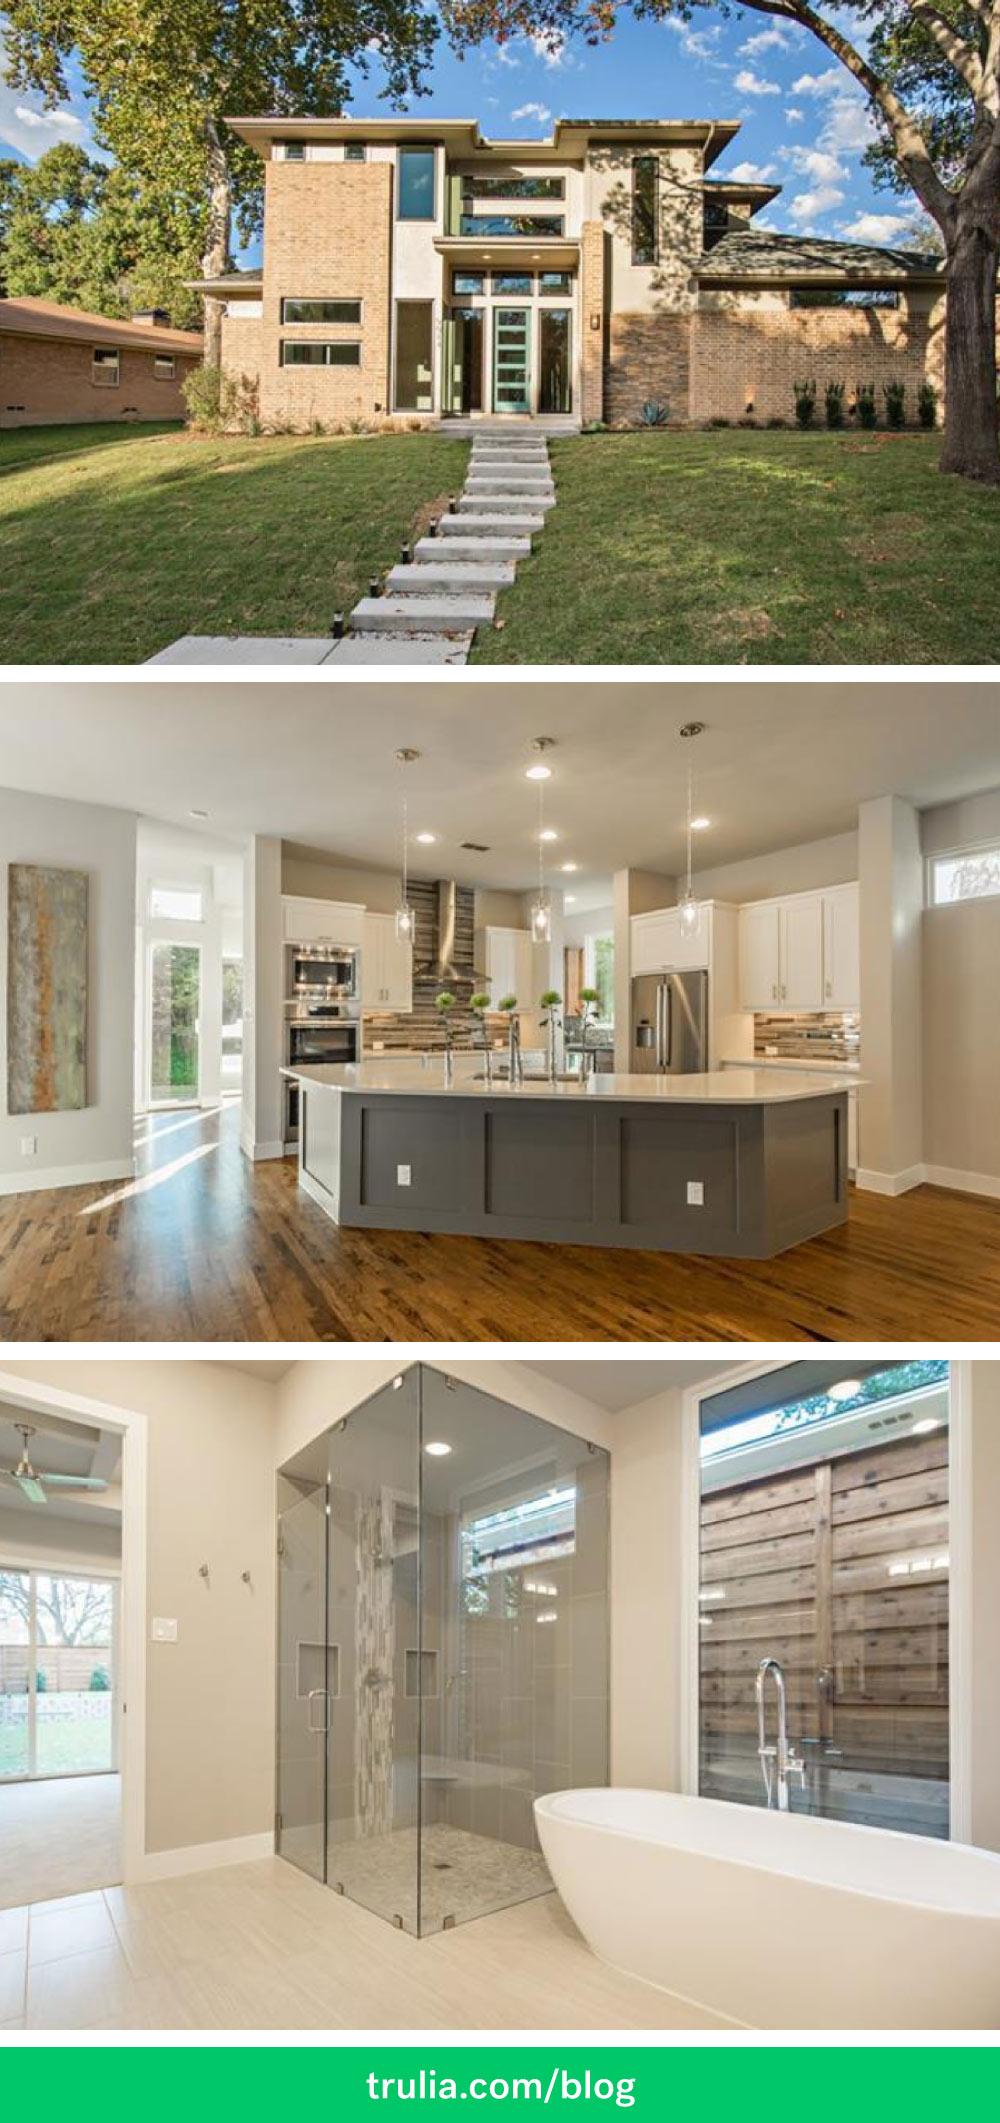 Dallas TX Real Estate Pinterest Home